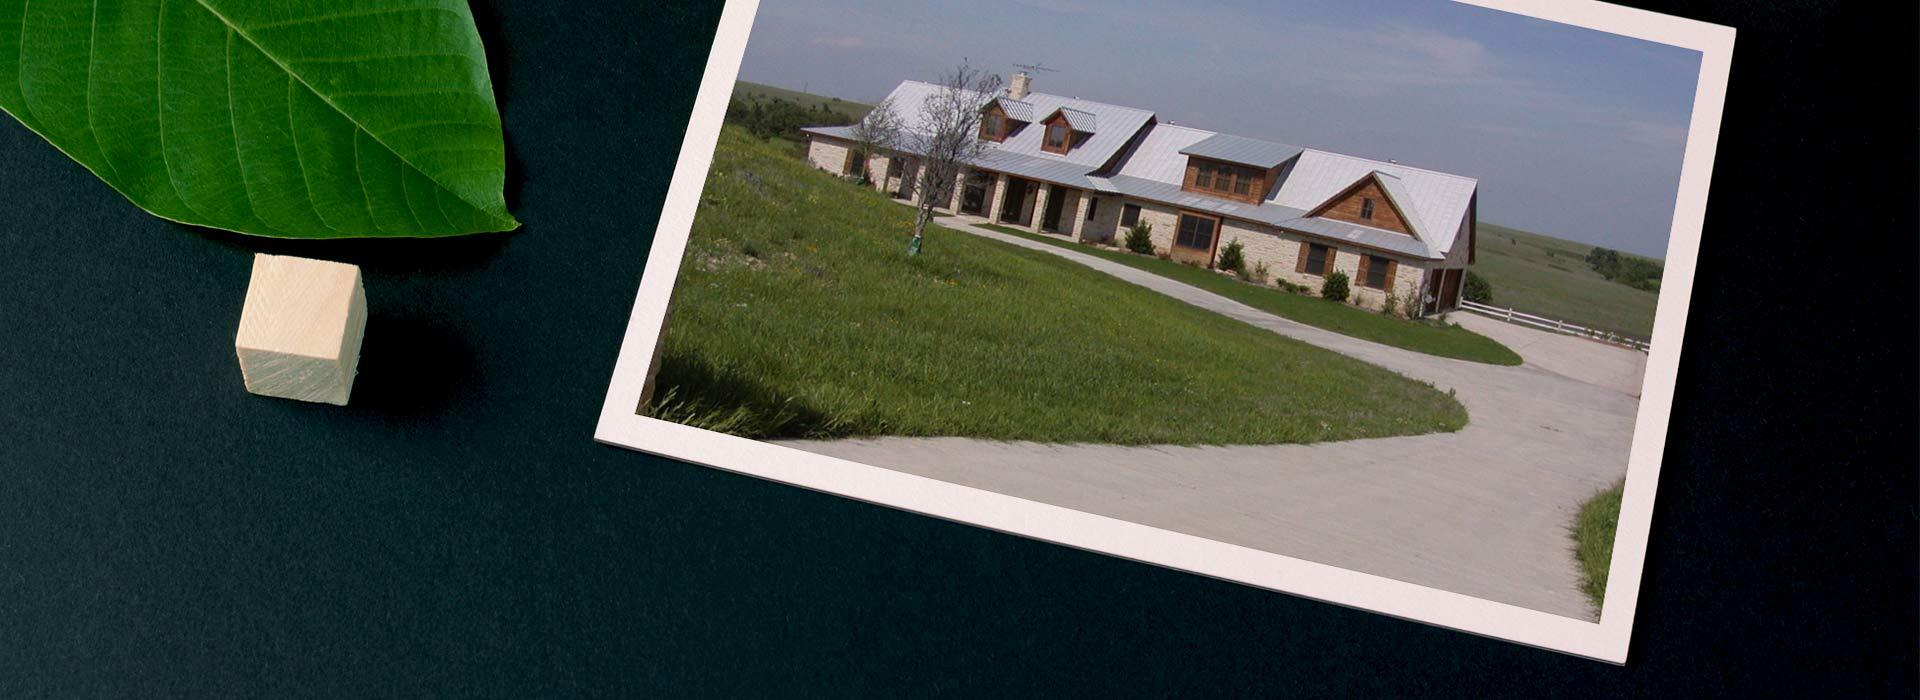 Ranch house - چه سبک معماری برای شما مناسب است ؟